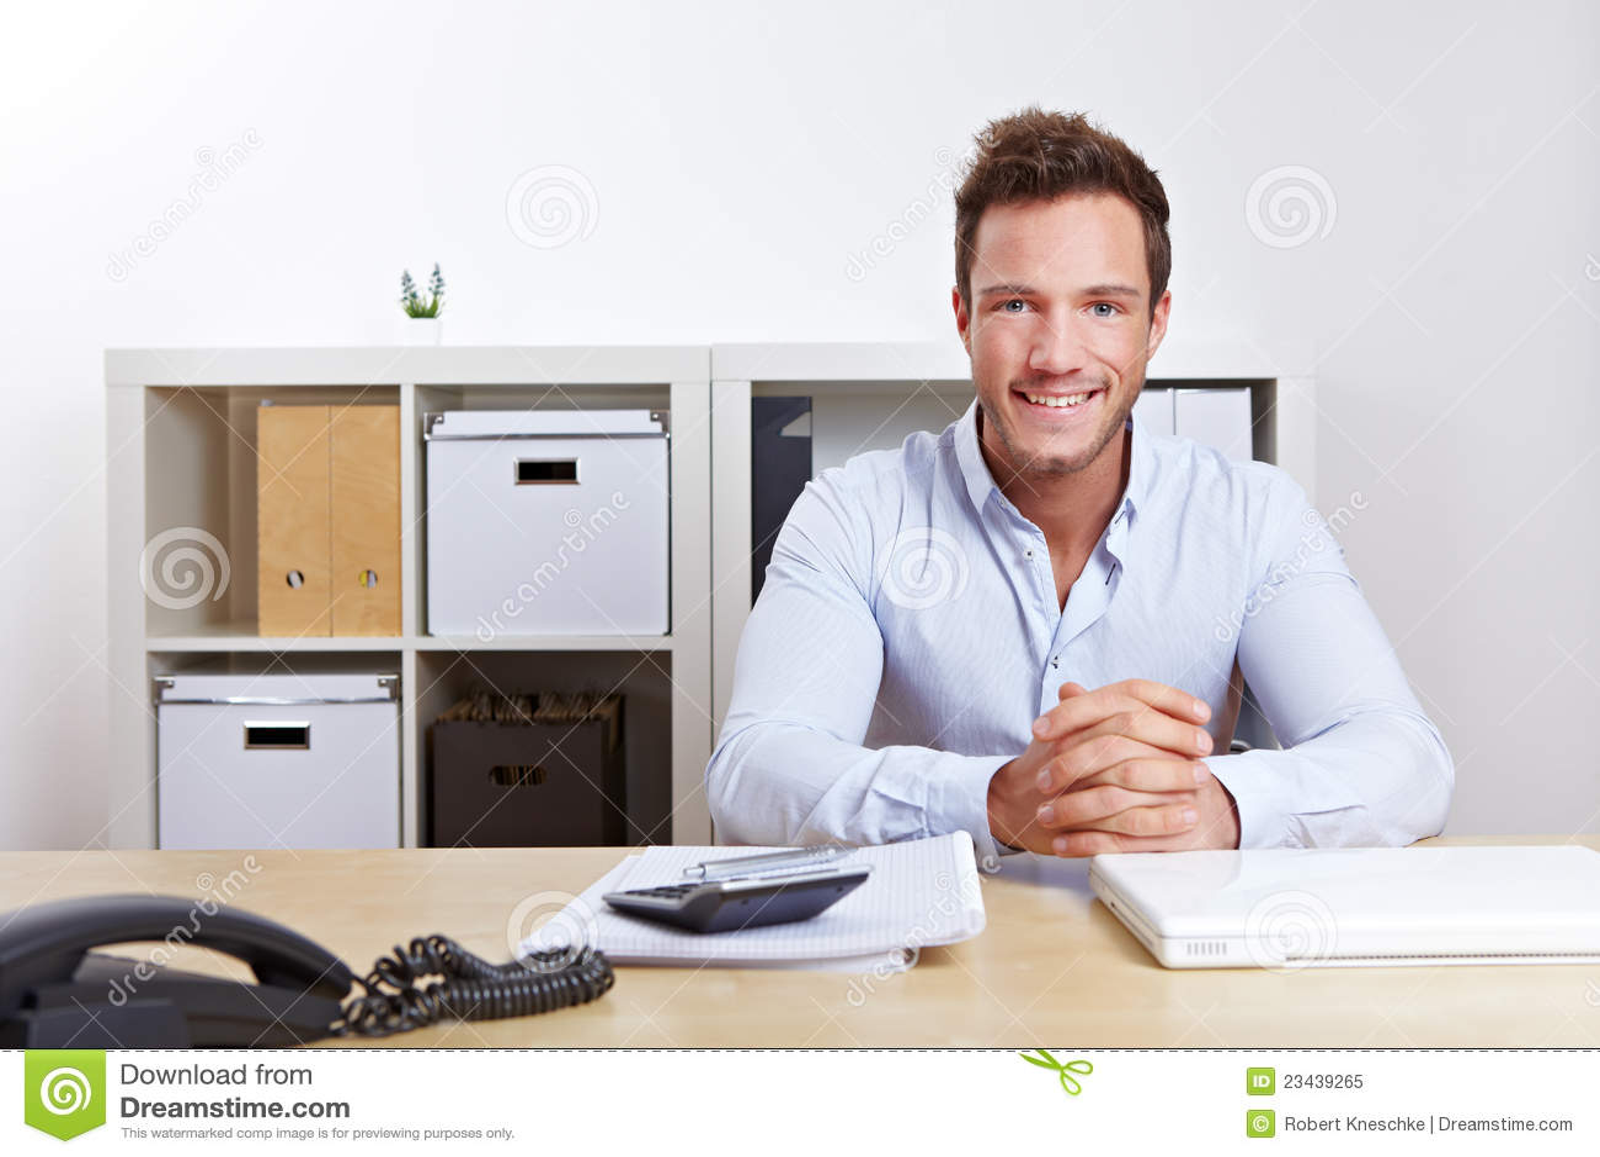 Smiling business consultant